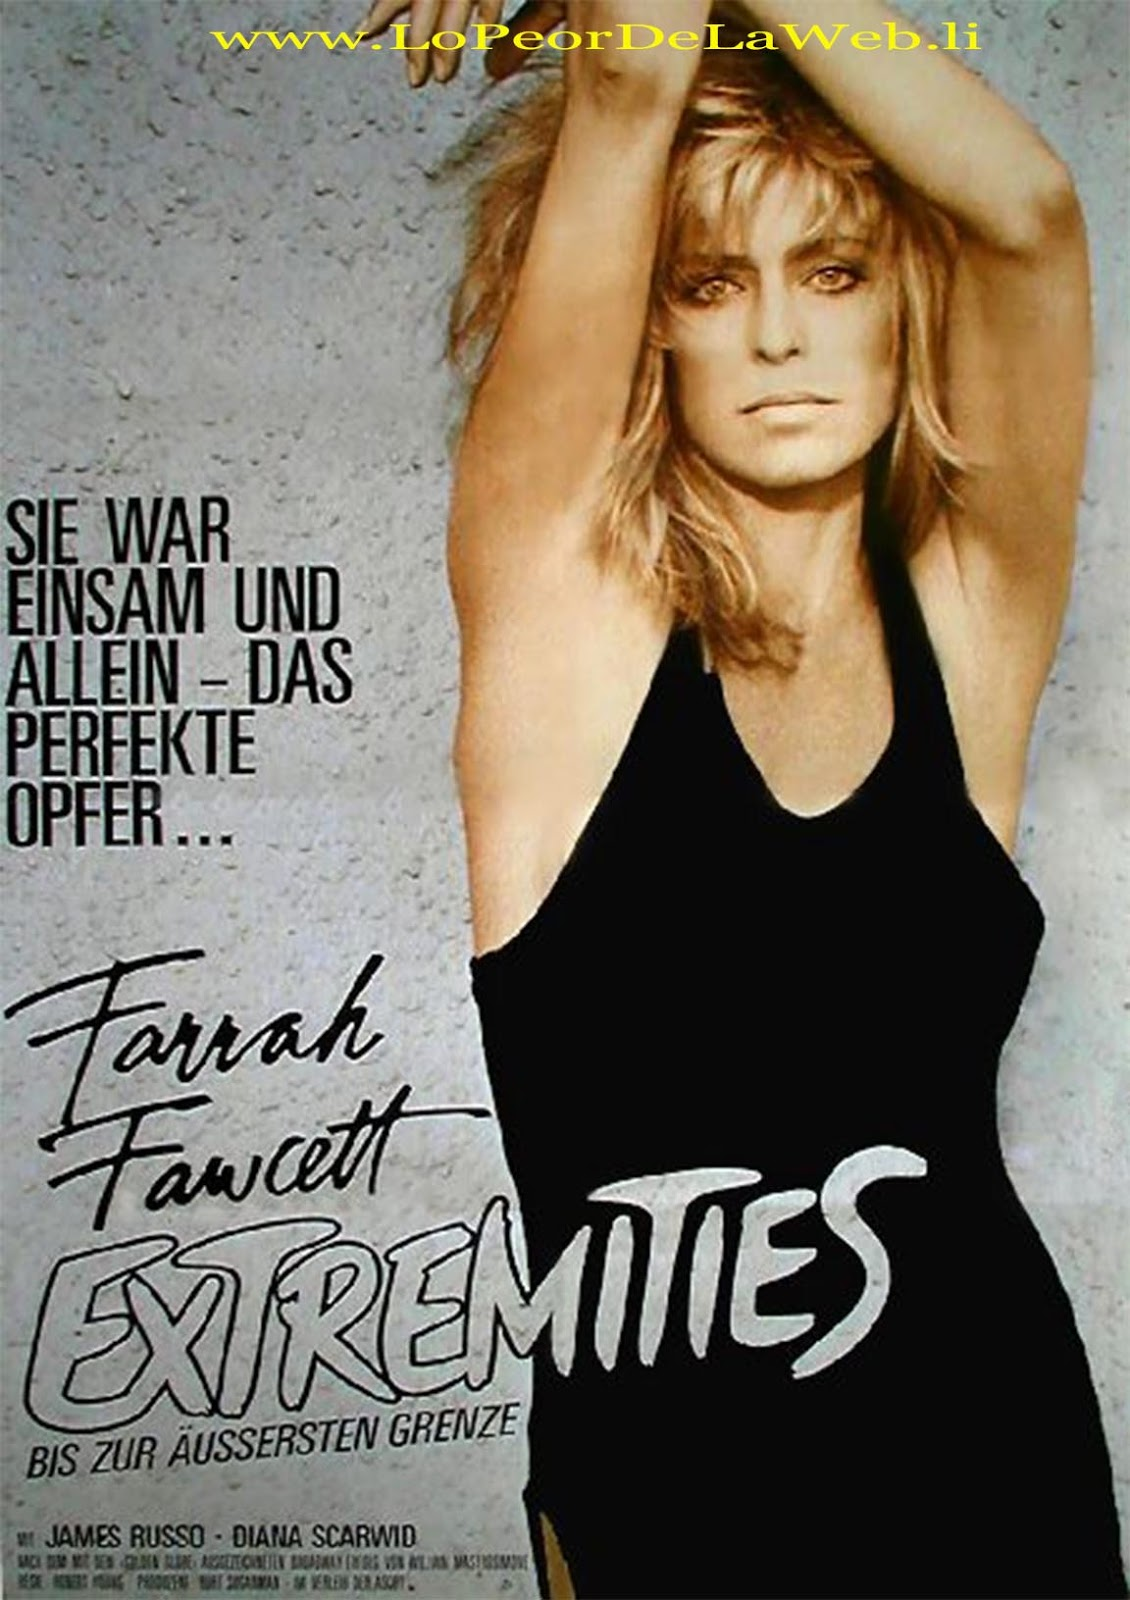 Acorralada 1986  Extremities  Farrah Fawcett  LoPeorDeLaWeb